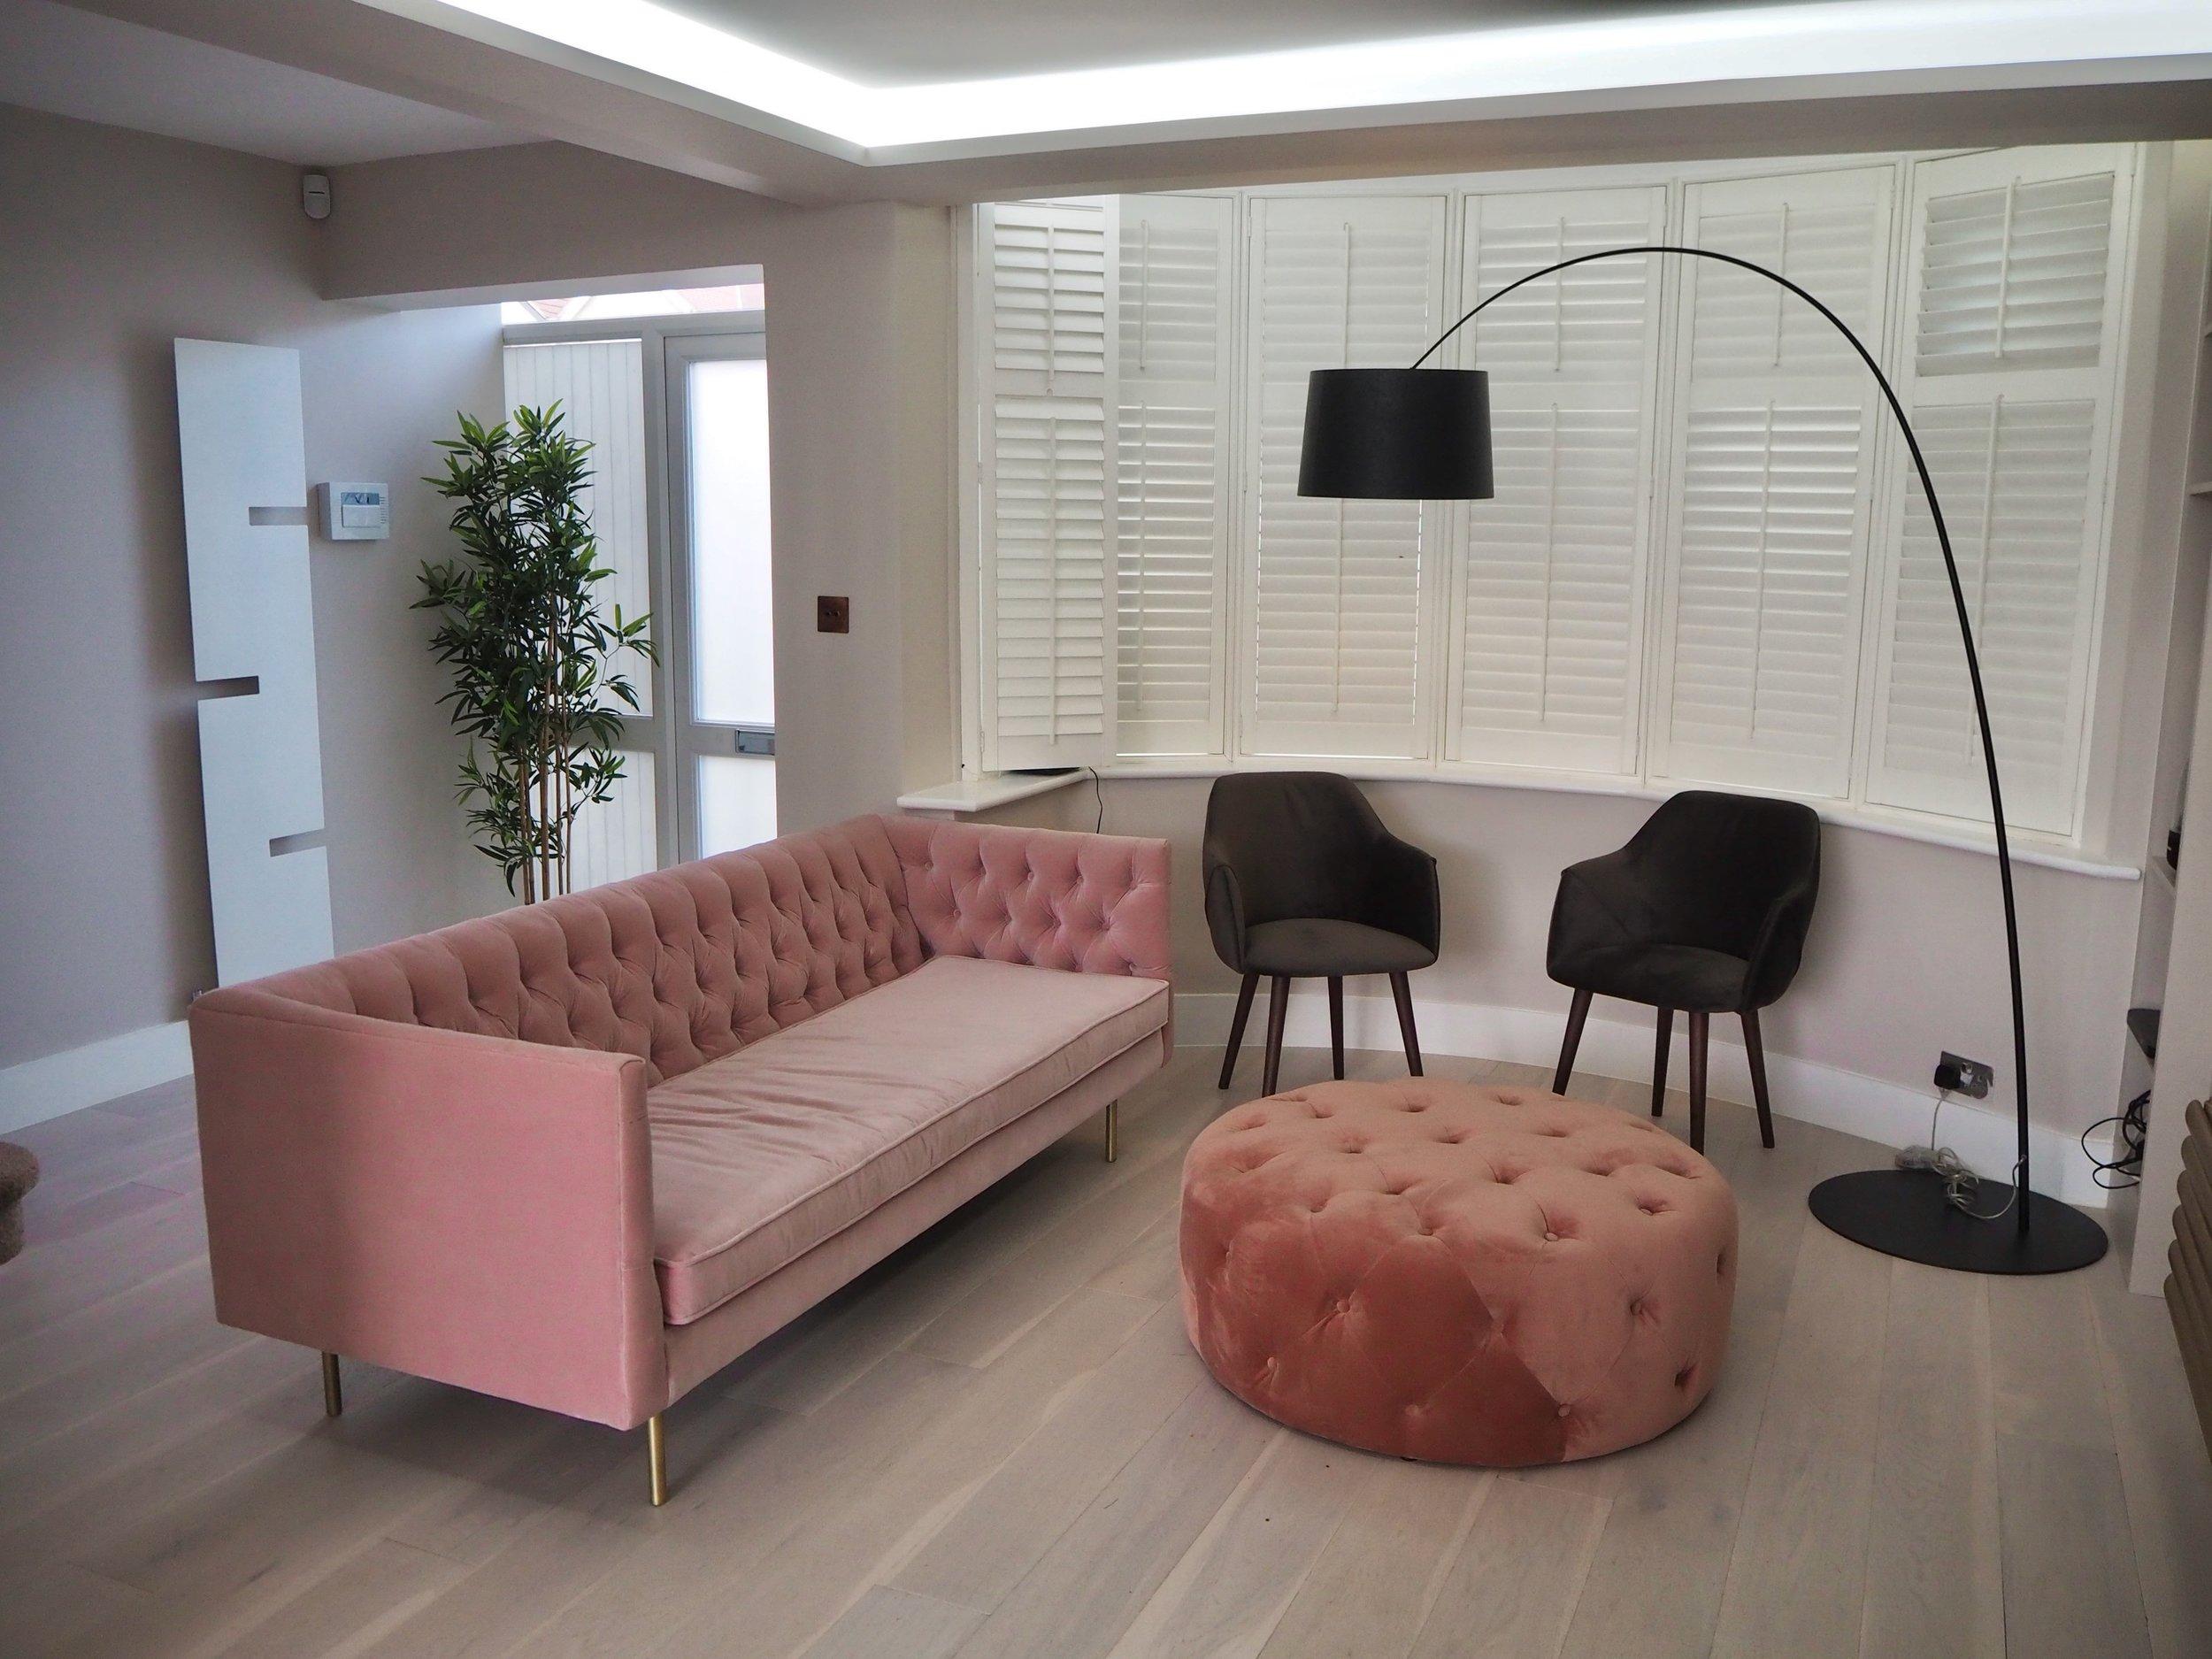 Duke of Design's latest London interior design project using MADE.COM furnishings